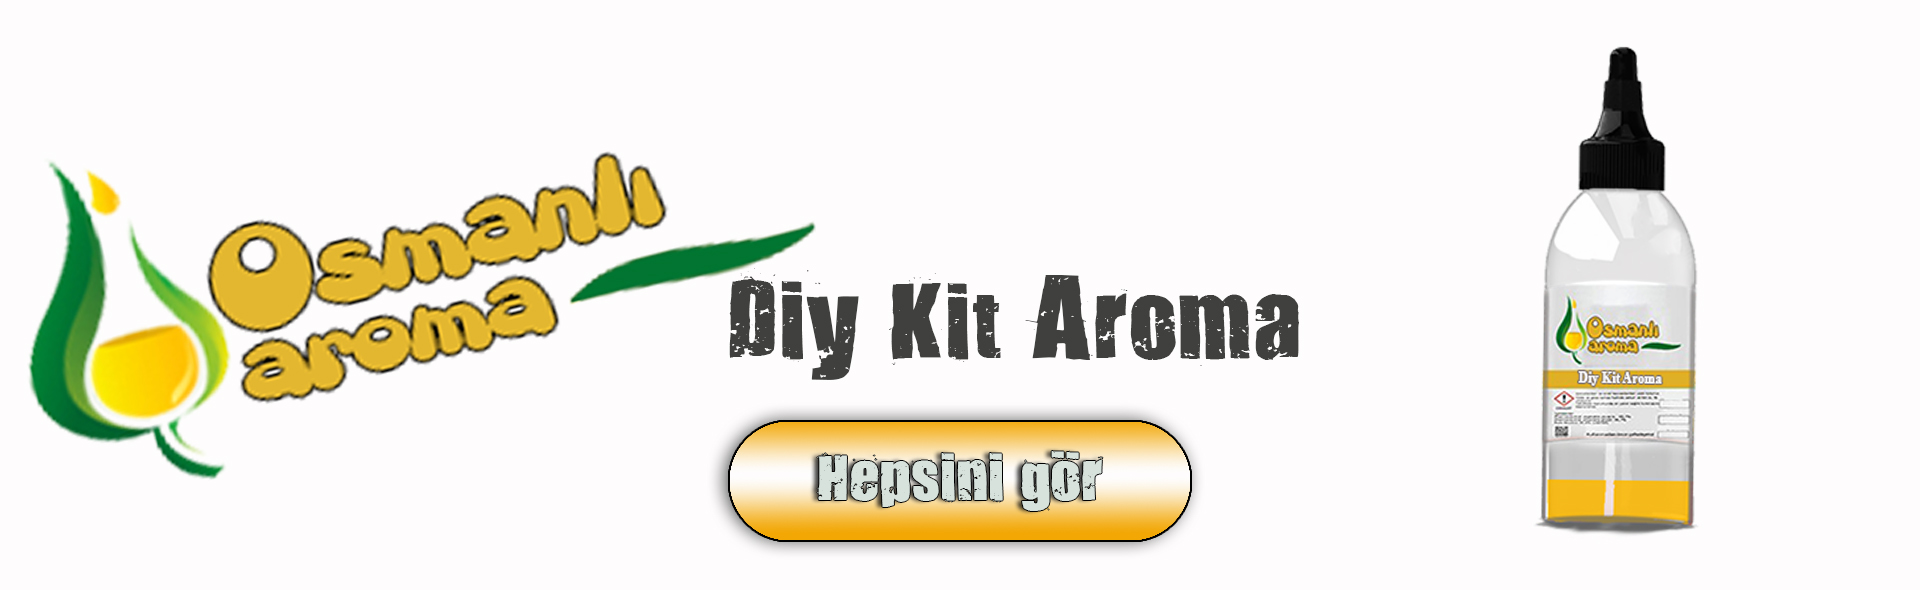 Diy Kit Aroma